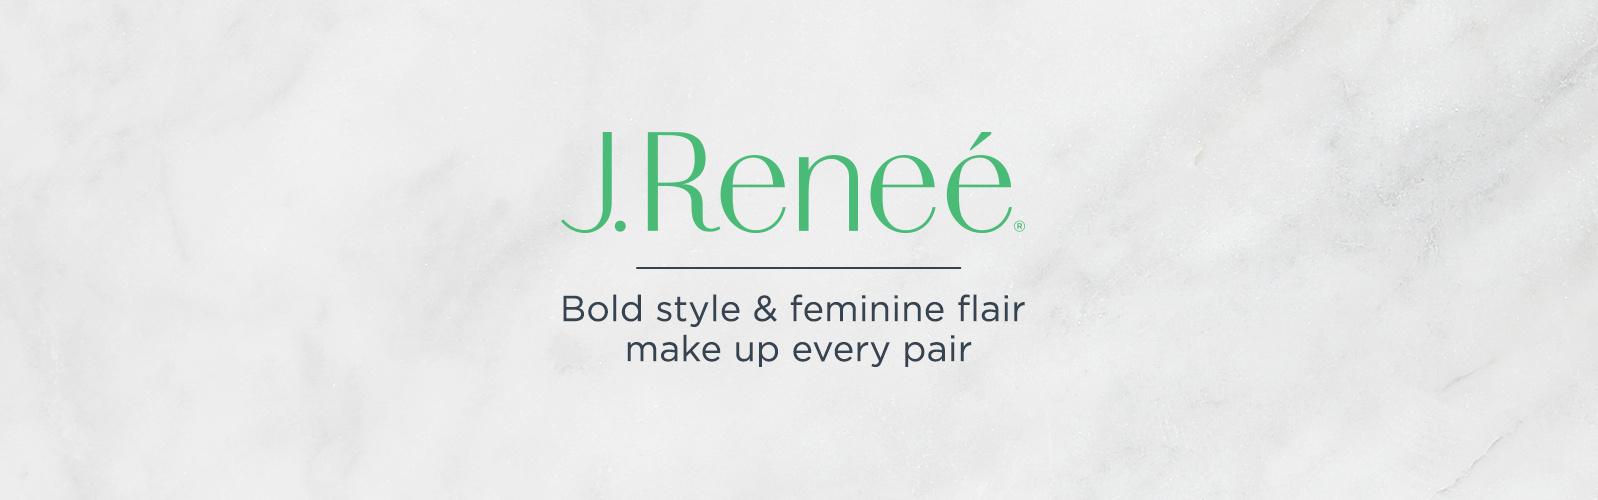 J. Renee — Bold style & feminine flair make up every pair